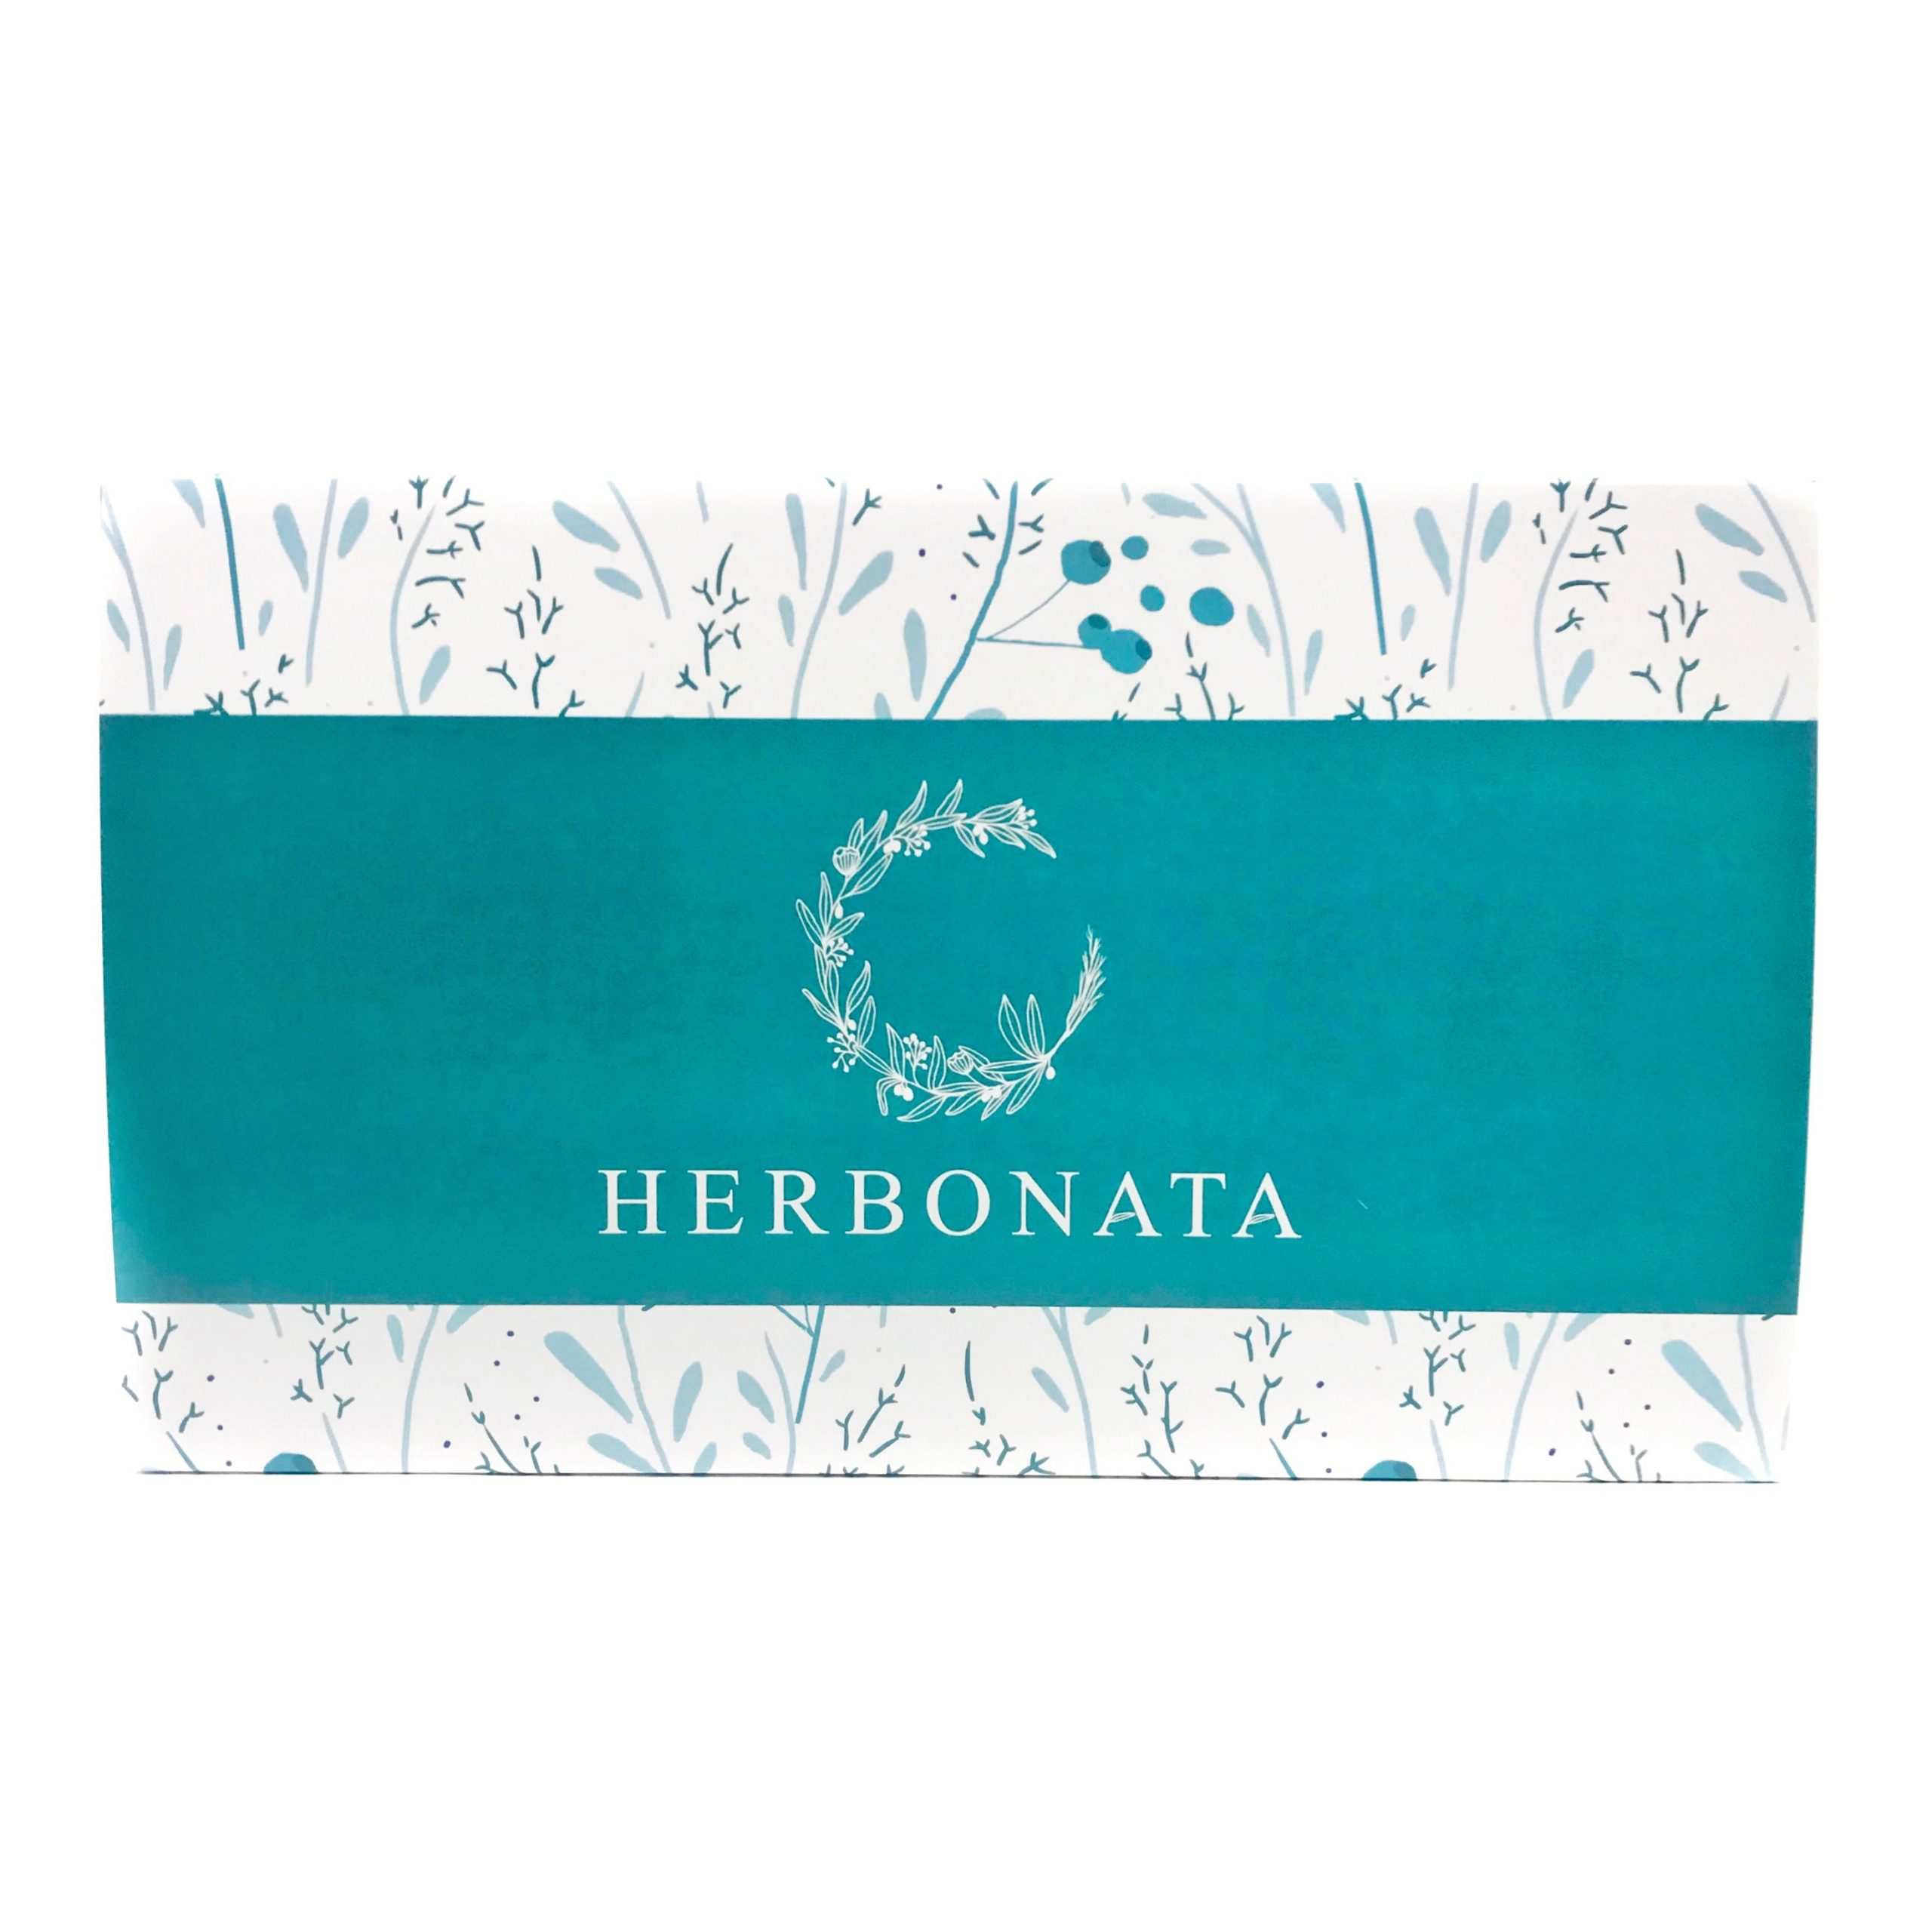 Boite Cadeau À Personnaliser - | Herbonata.fr avec Boite À Personnaliser